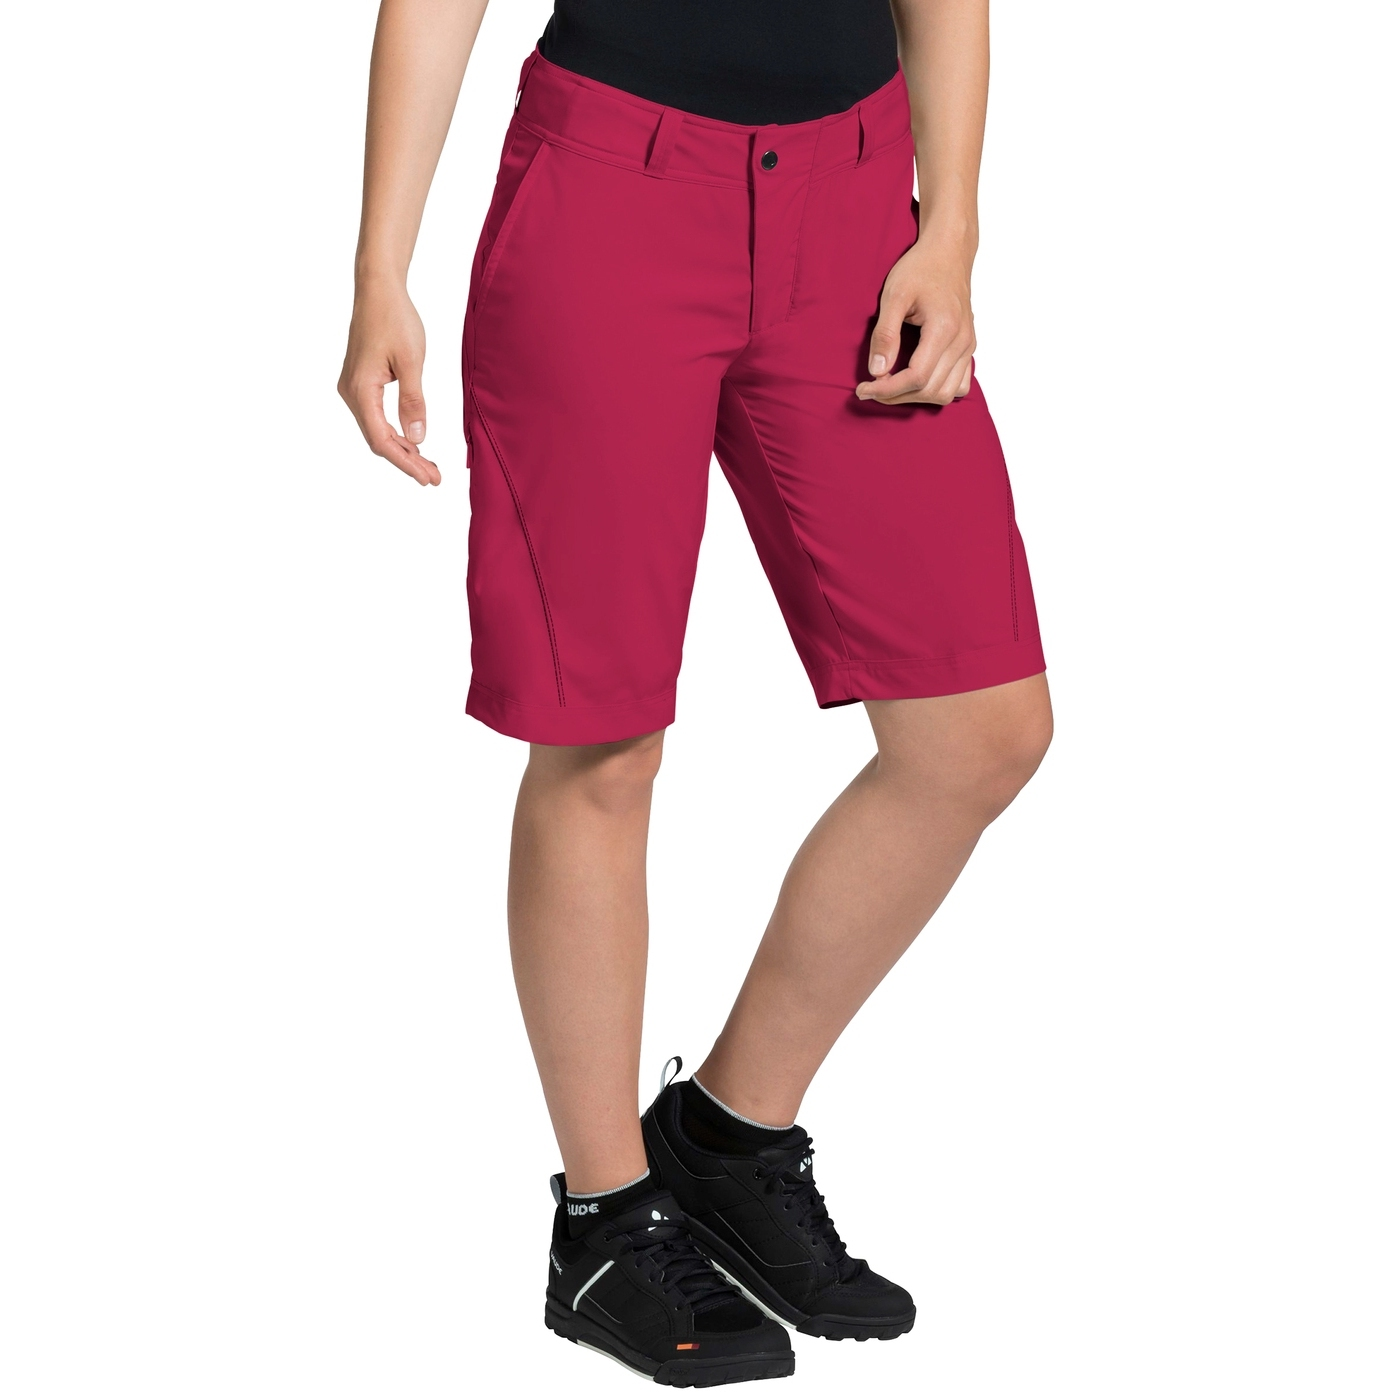 Bild von Vaude Ledro Damen Shorts - crimson red